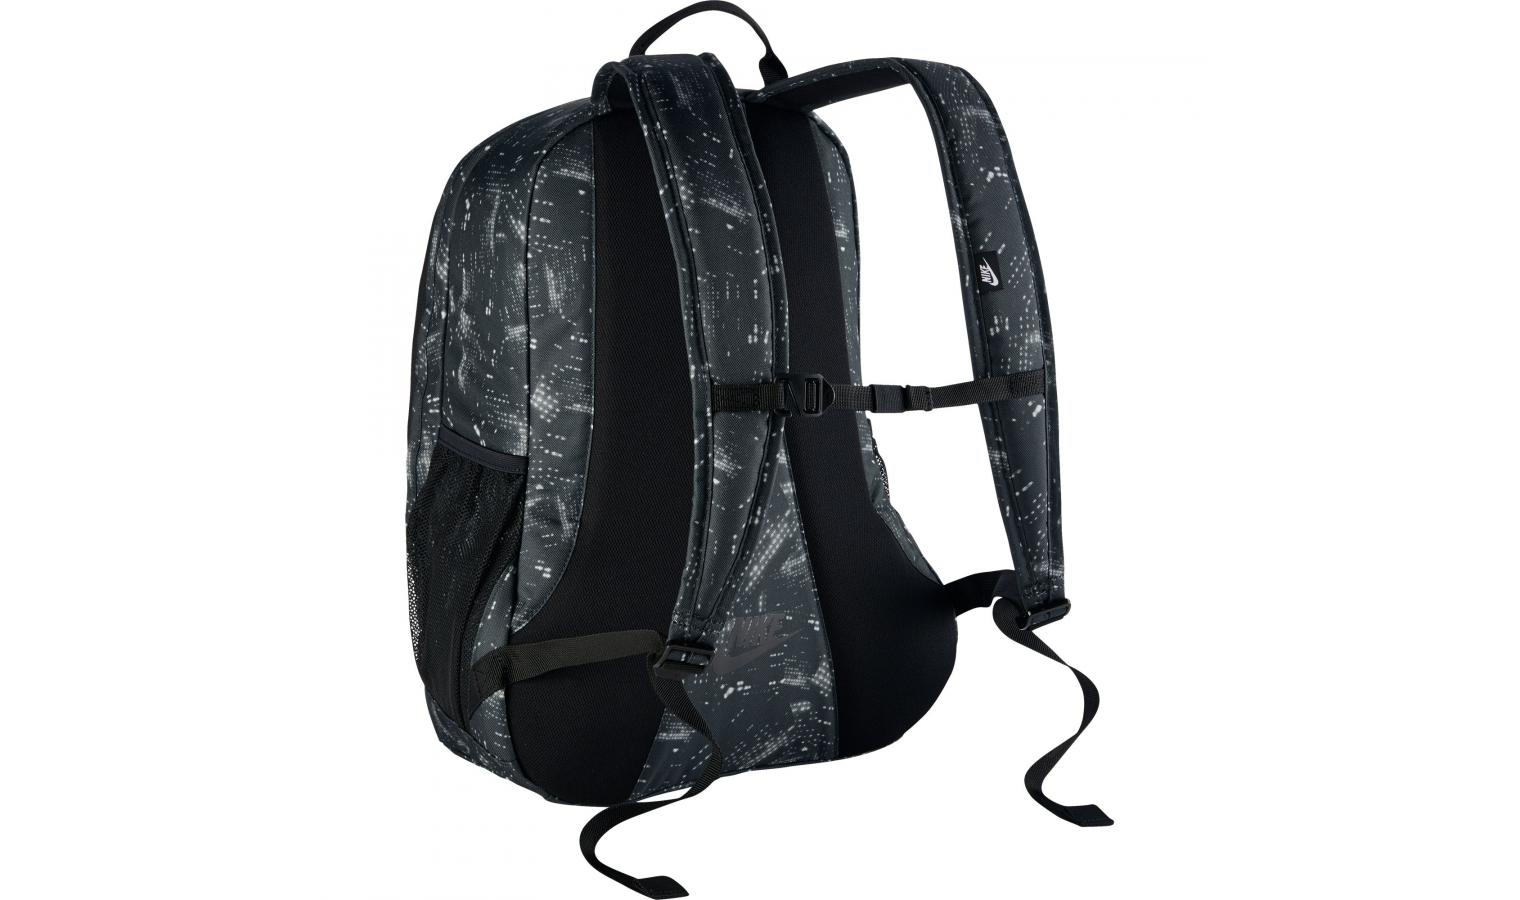 Sportovní batoh Nike HAYWARD FUTURA 2.0 PRINT BACKPACK černý  98957002ad